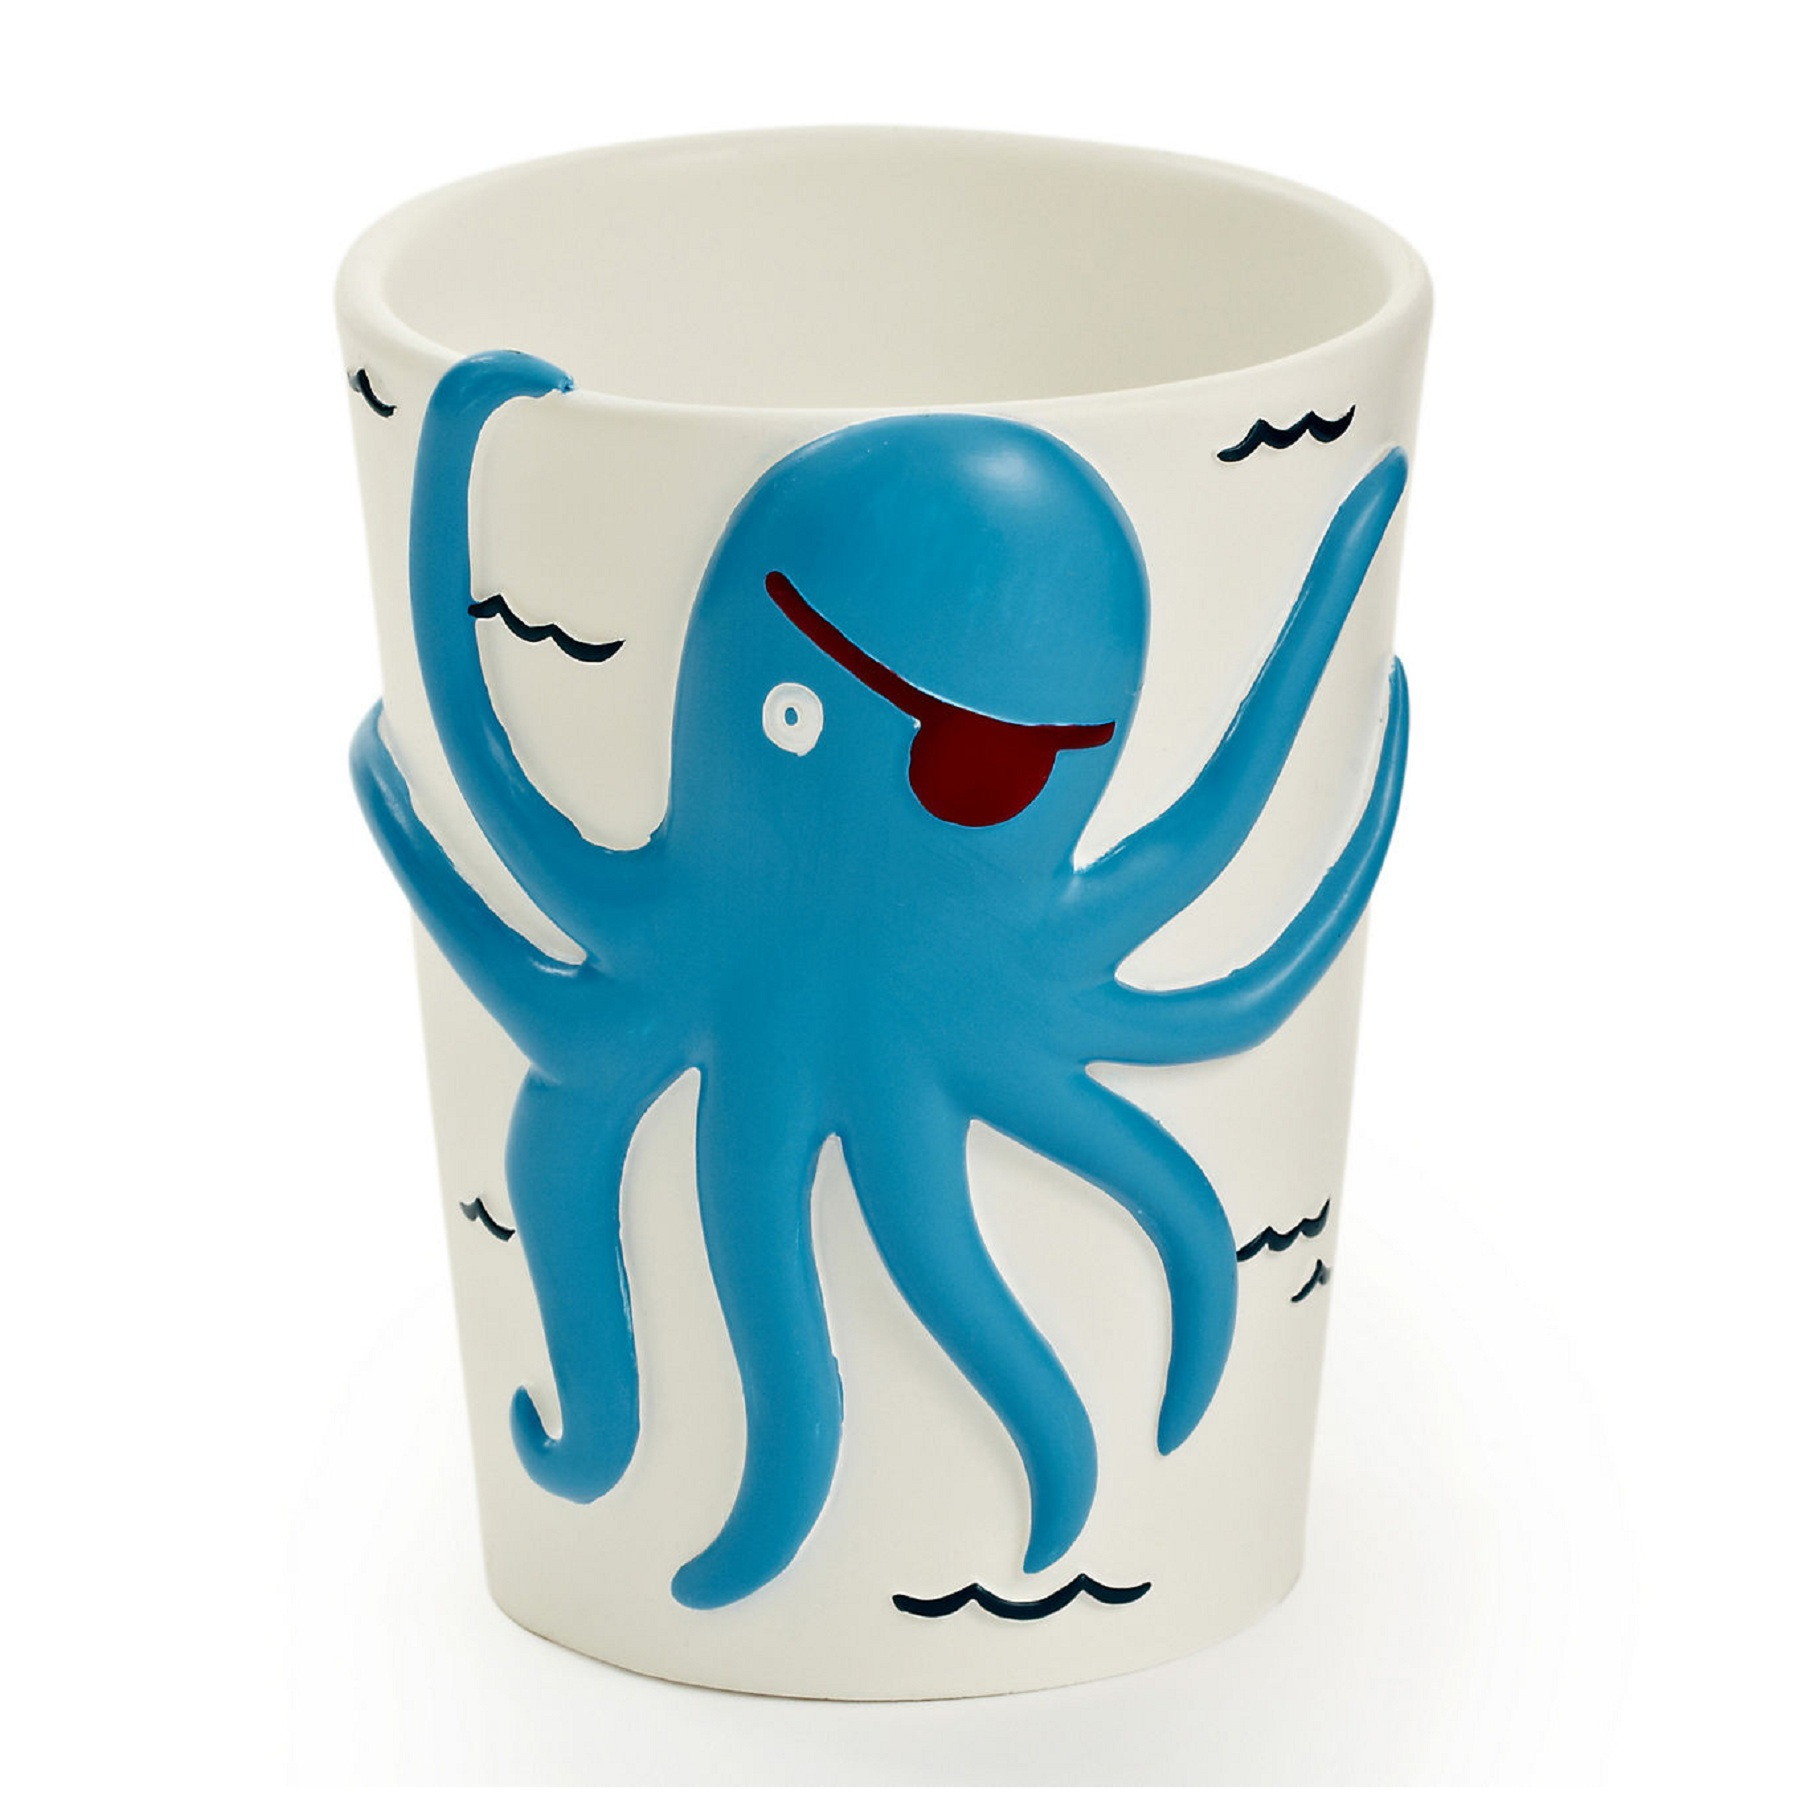 Для ванной Стакан для зубной пасты детский Kassatex Pirates stakan-dlya-zubnoy-pasty-pirates-ot-kassatex-ssha-kitay.jpg